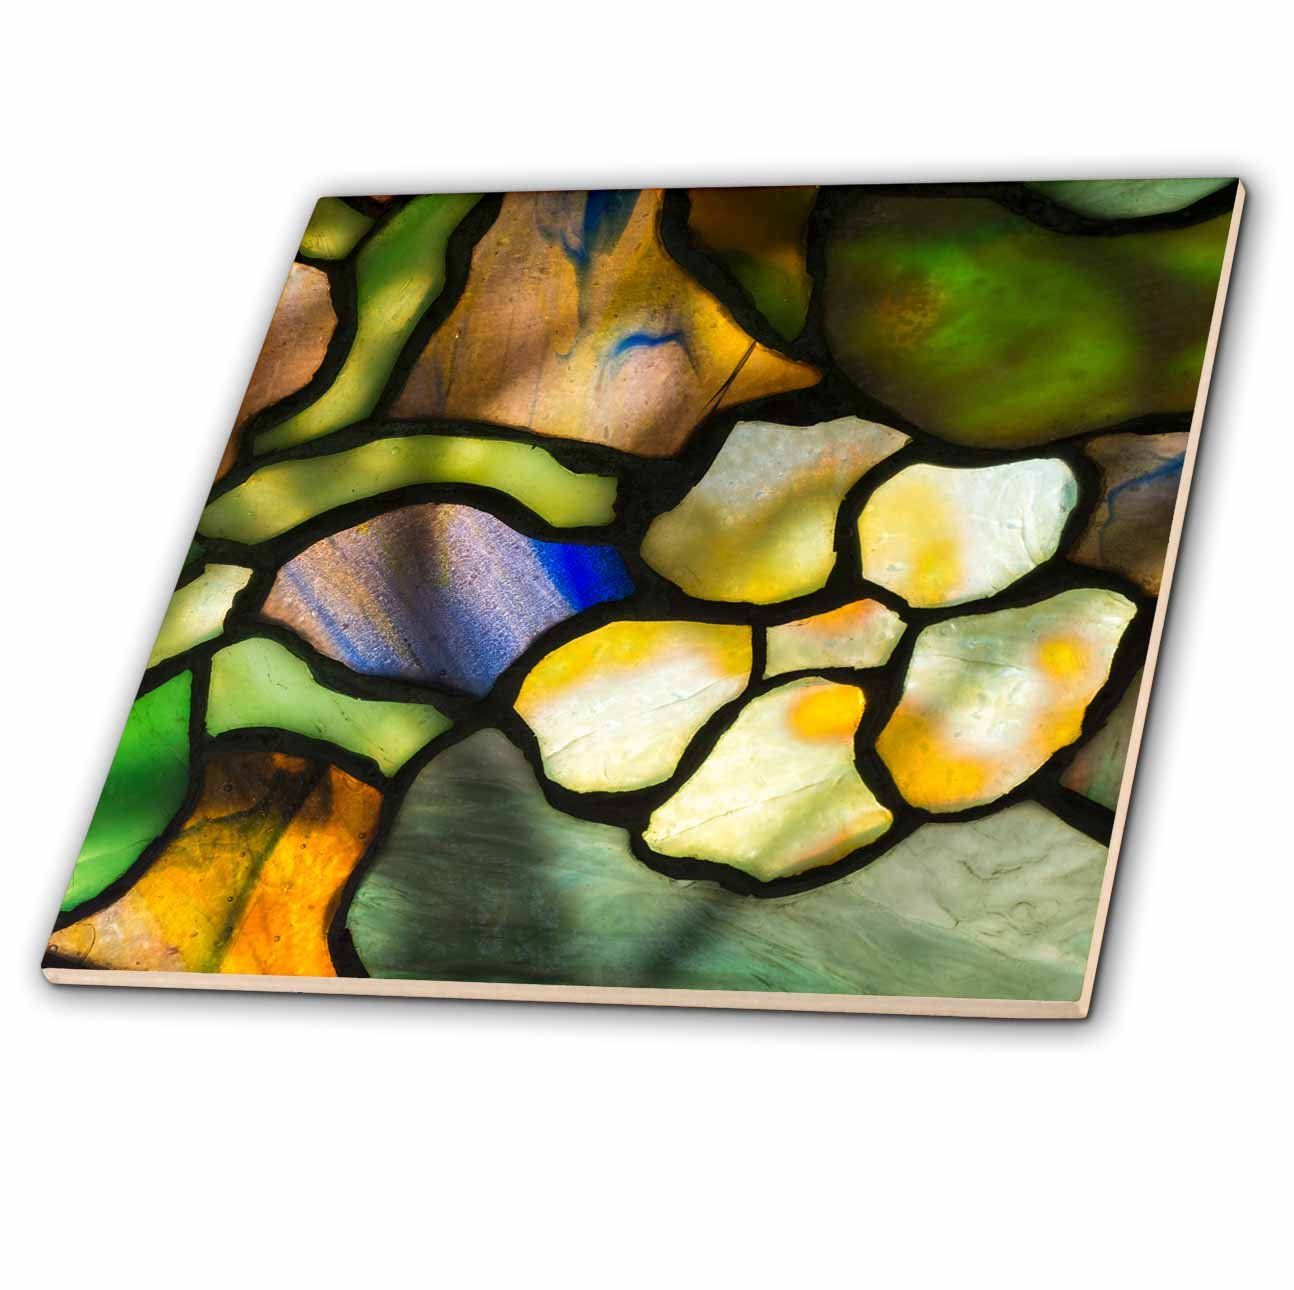 3dRose Danita Delimont - Artwork - New York, Tiffany stained glass lamp shade. - 4 Inch Ceramic Tile (ct_279255_1)